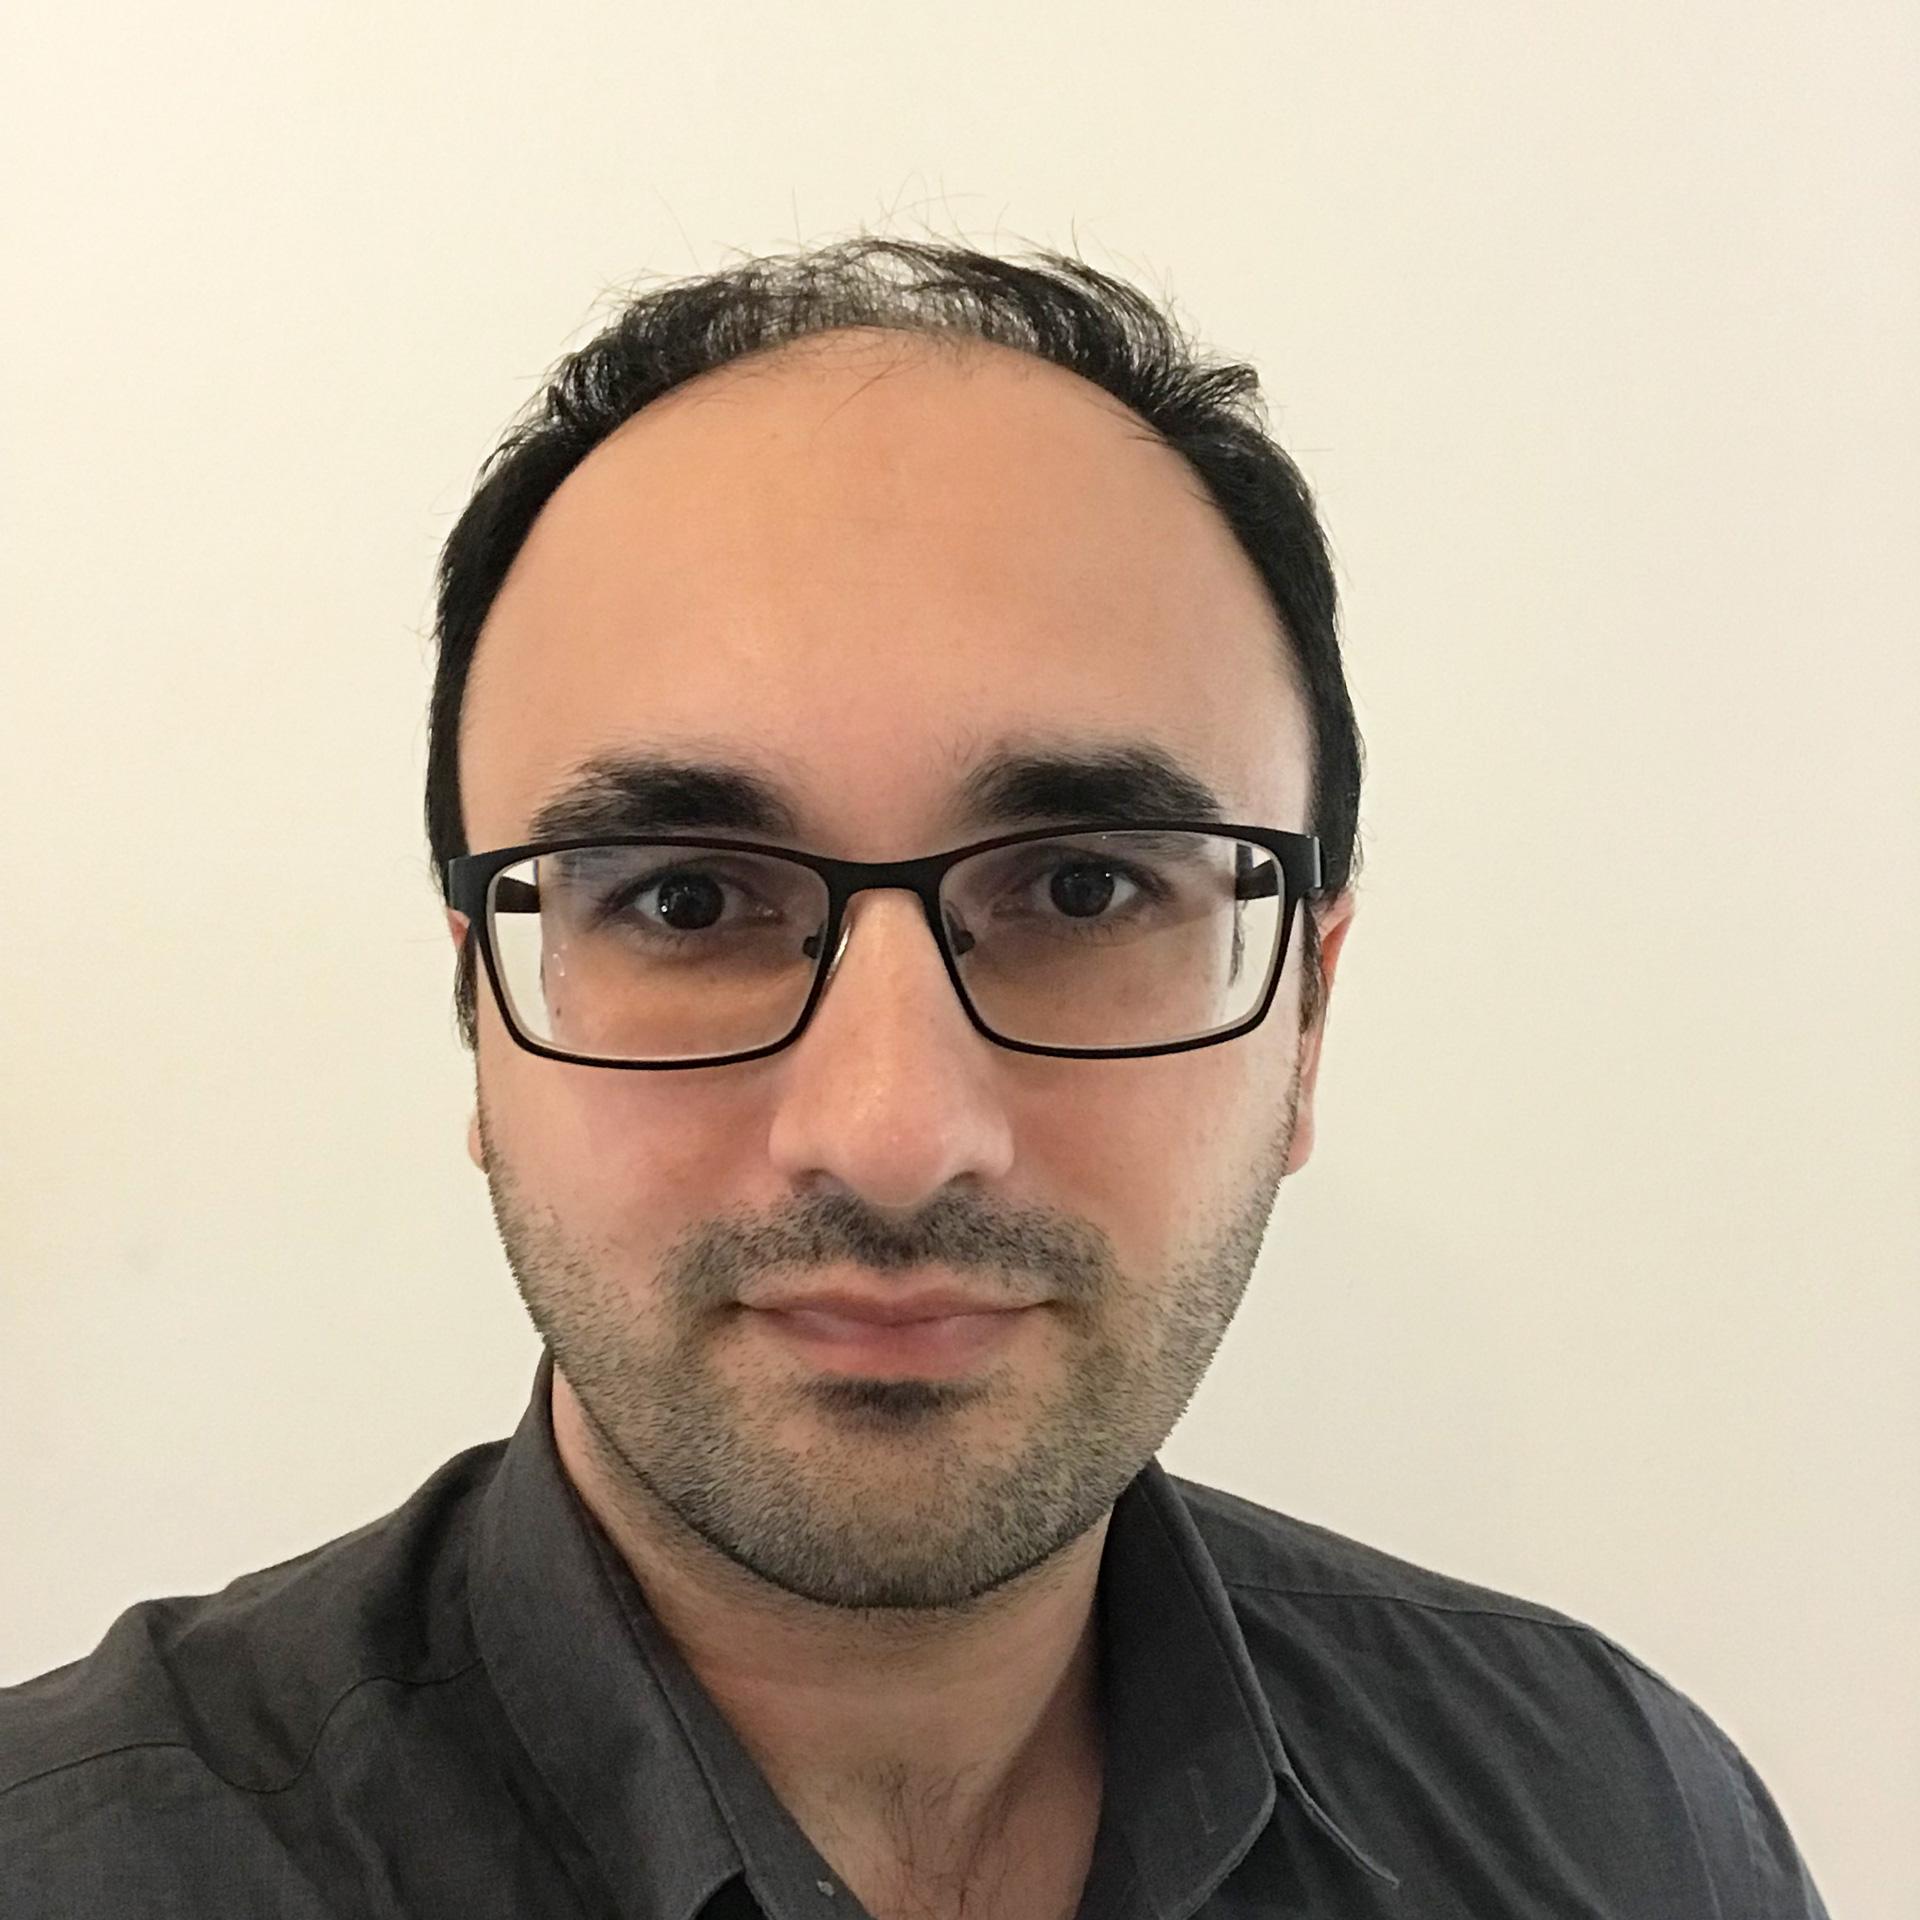 Mohammed El-Haddad